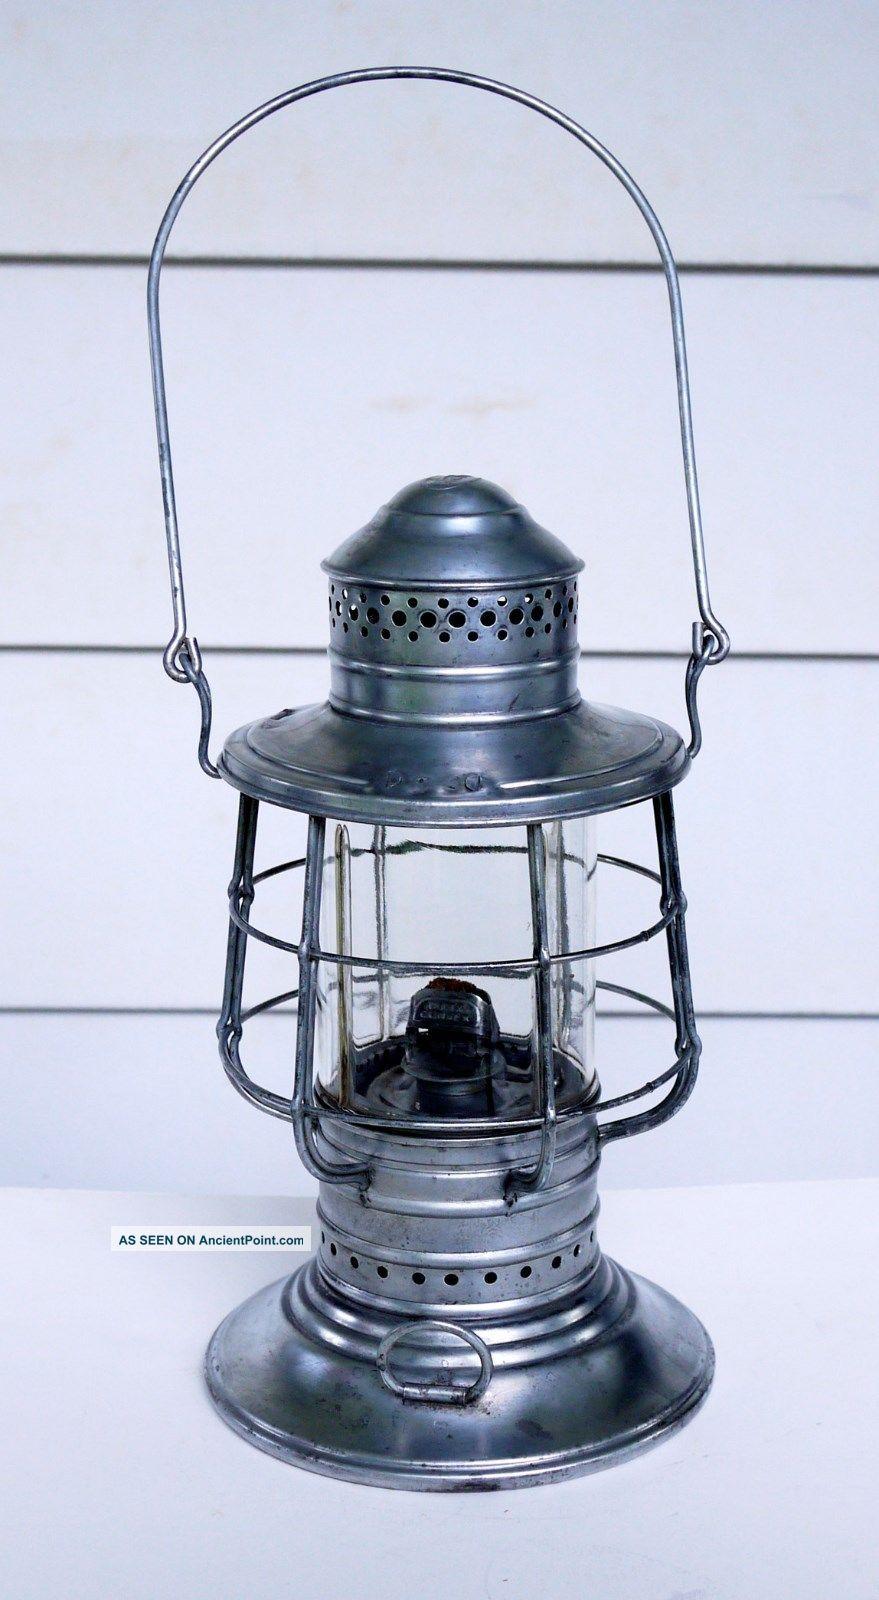 Nautical Lantern Dietz Bellbottom All Kopp Globe Lamps & Lighting photo